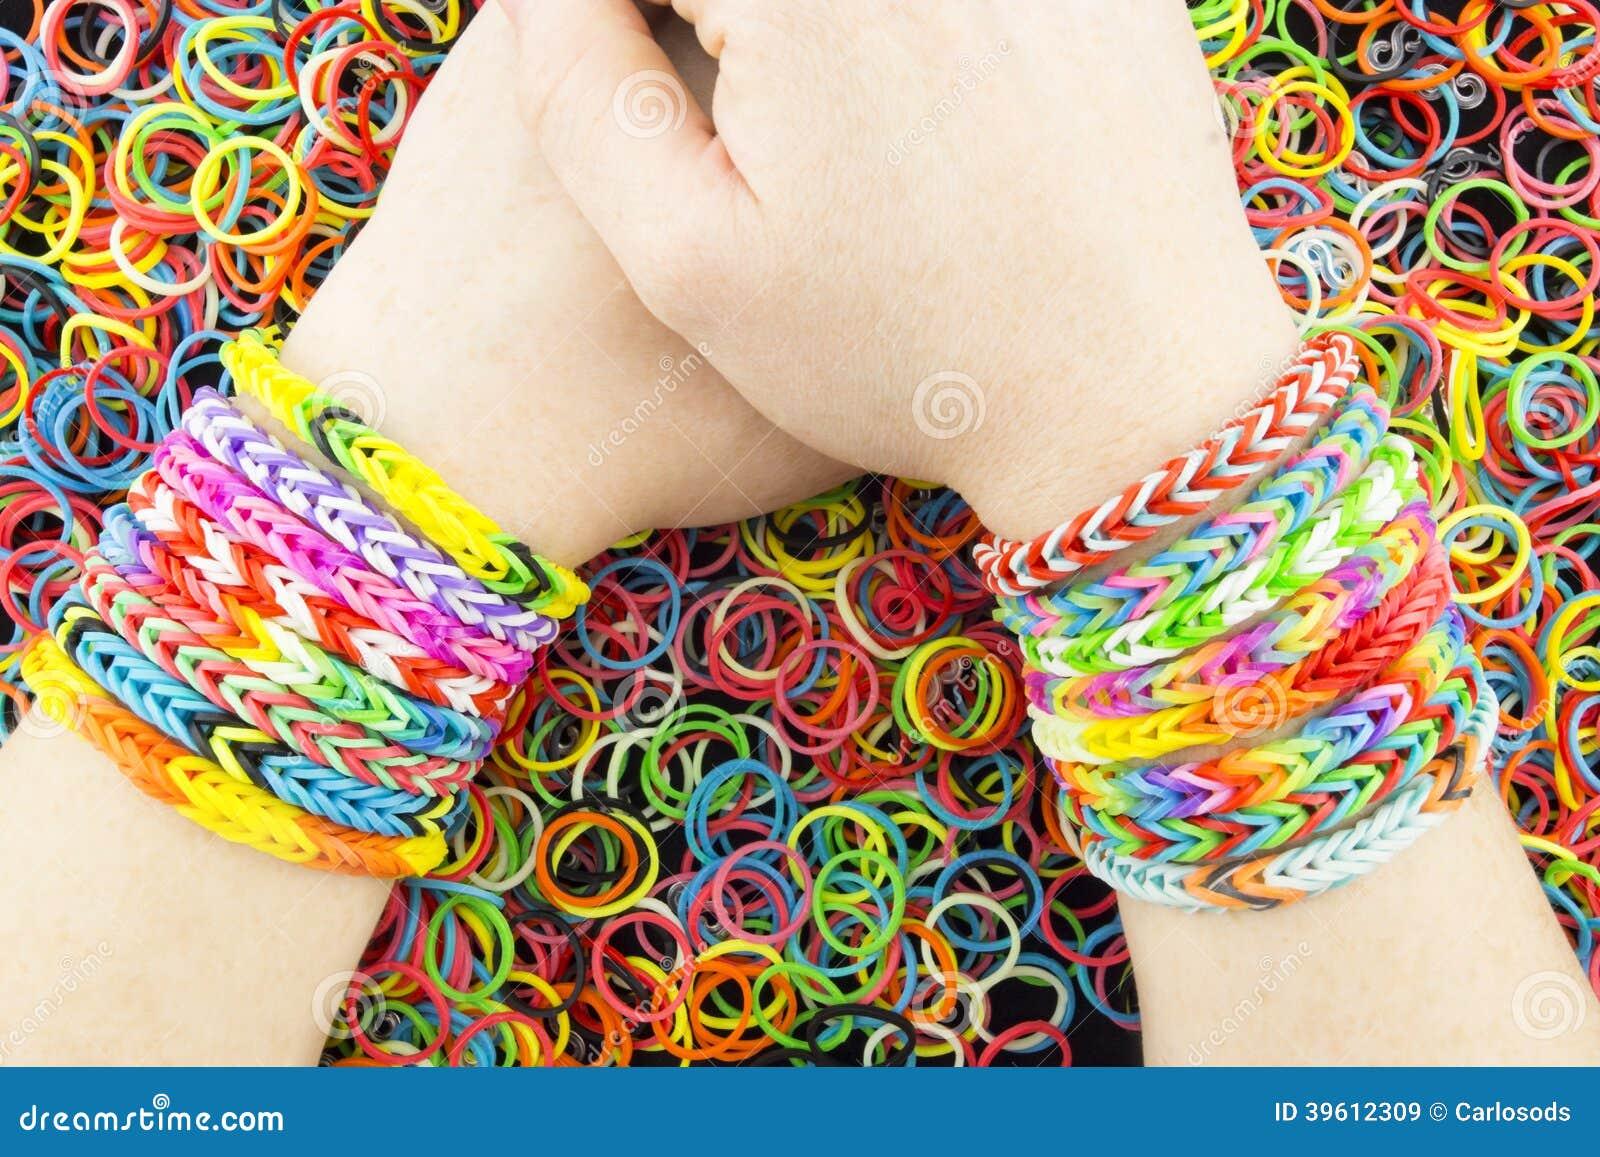 Rubber Bands Bracelets